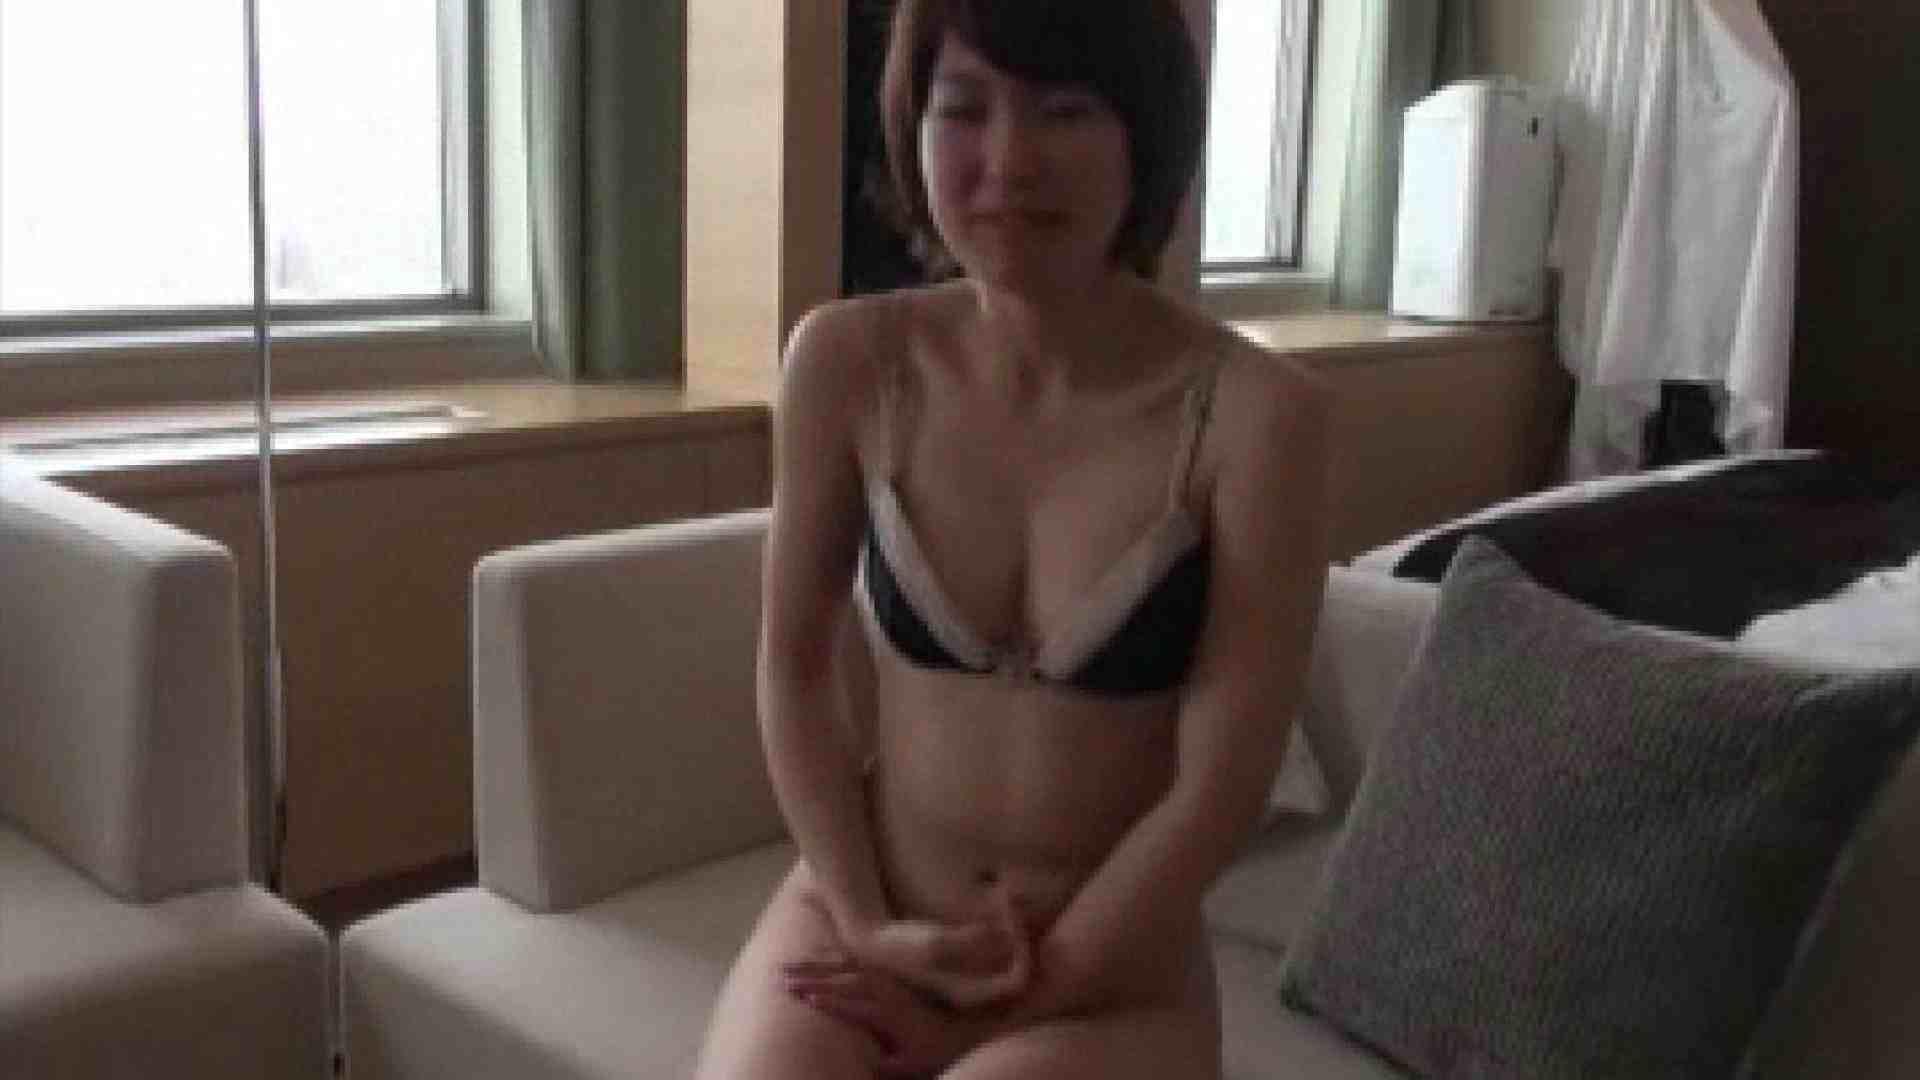 Hで可愛くてケシカラン! Vol.13 OL裸体 | 流出作品  59画像 13